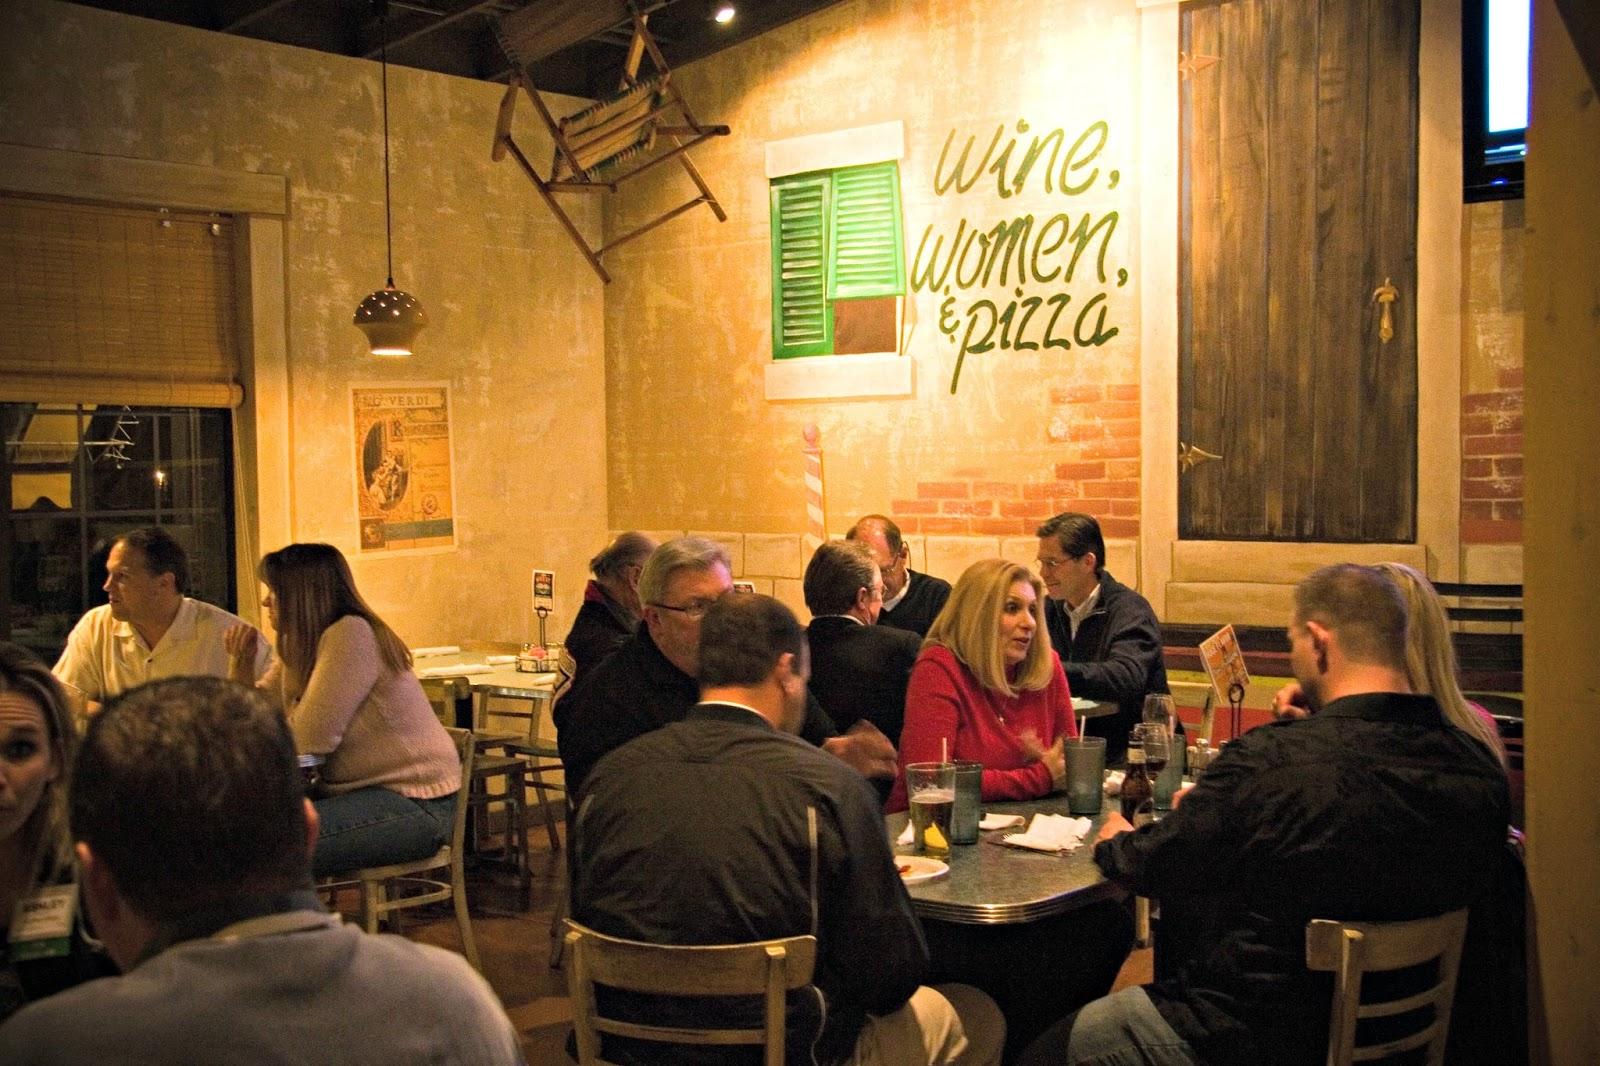 Dierbergs Osage Beach Restaurant